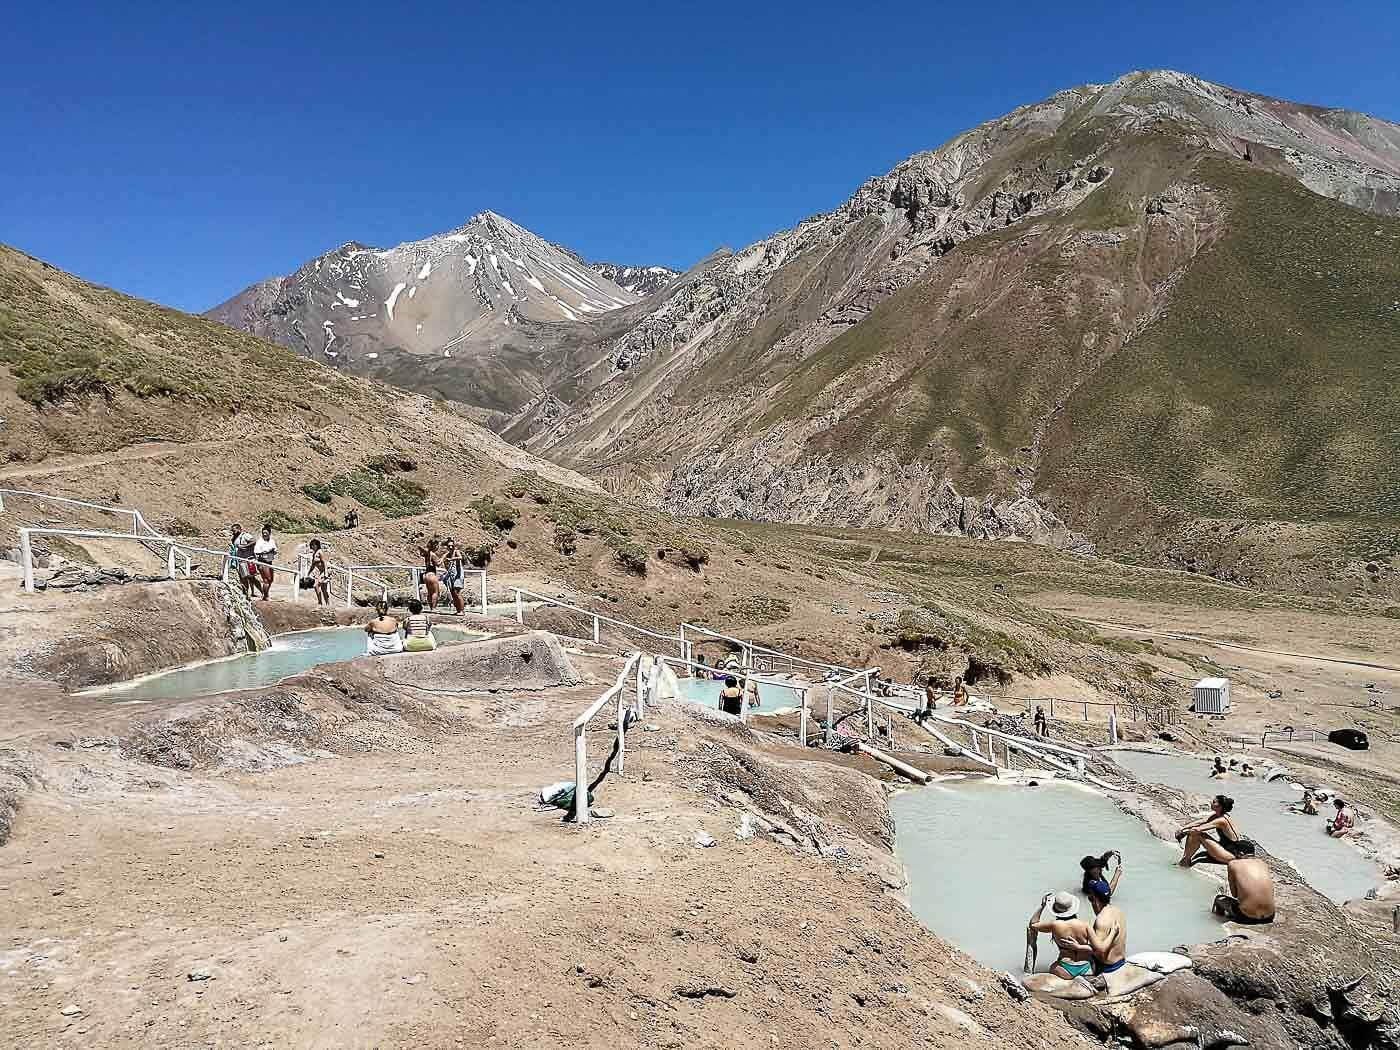 Cajon del Maipo e Embalse El Yeso- Termas